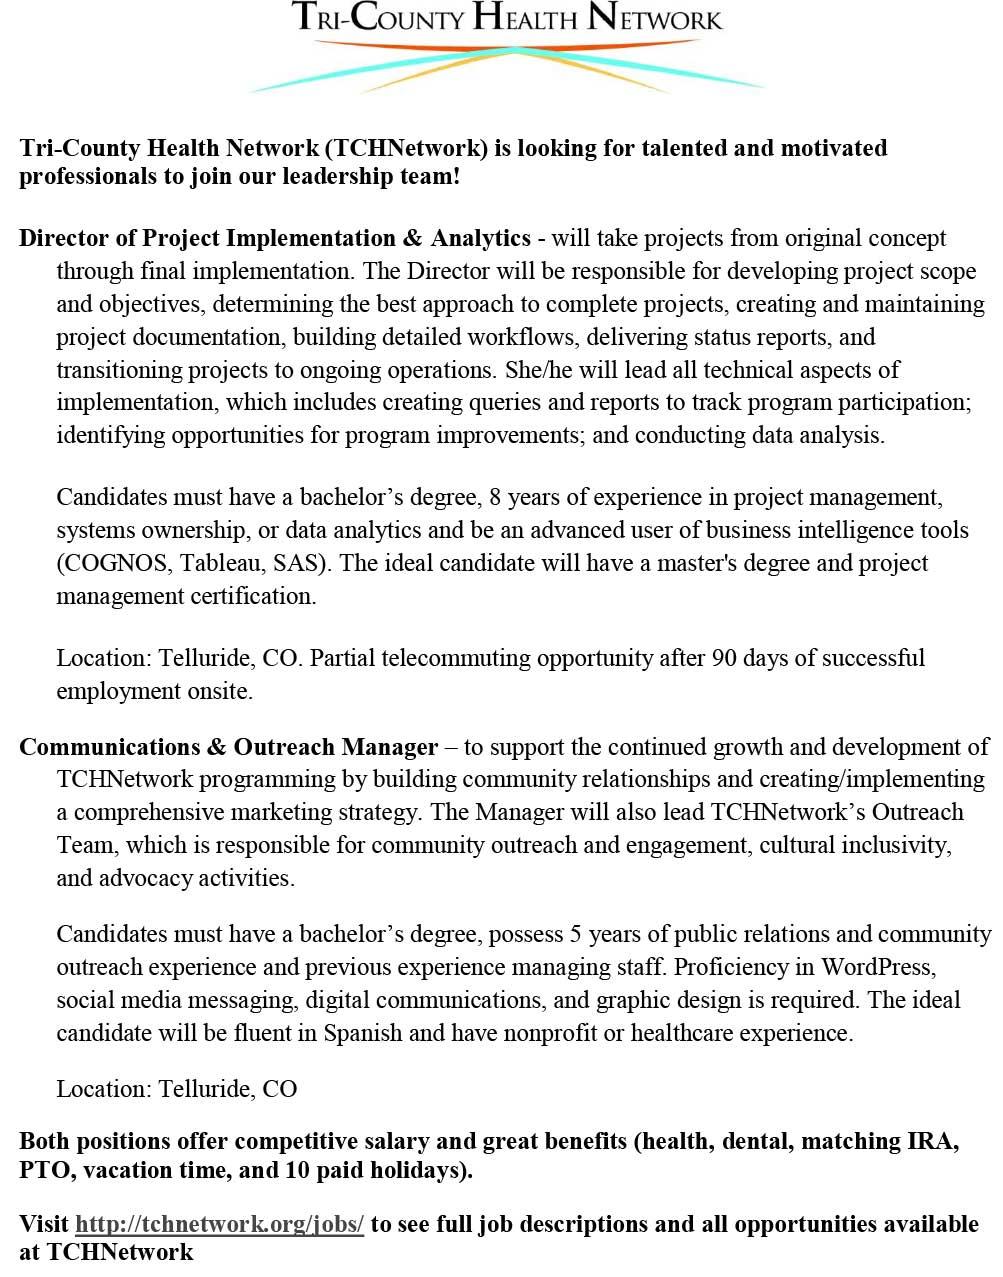 tri-county-job-posting